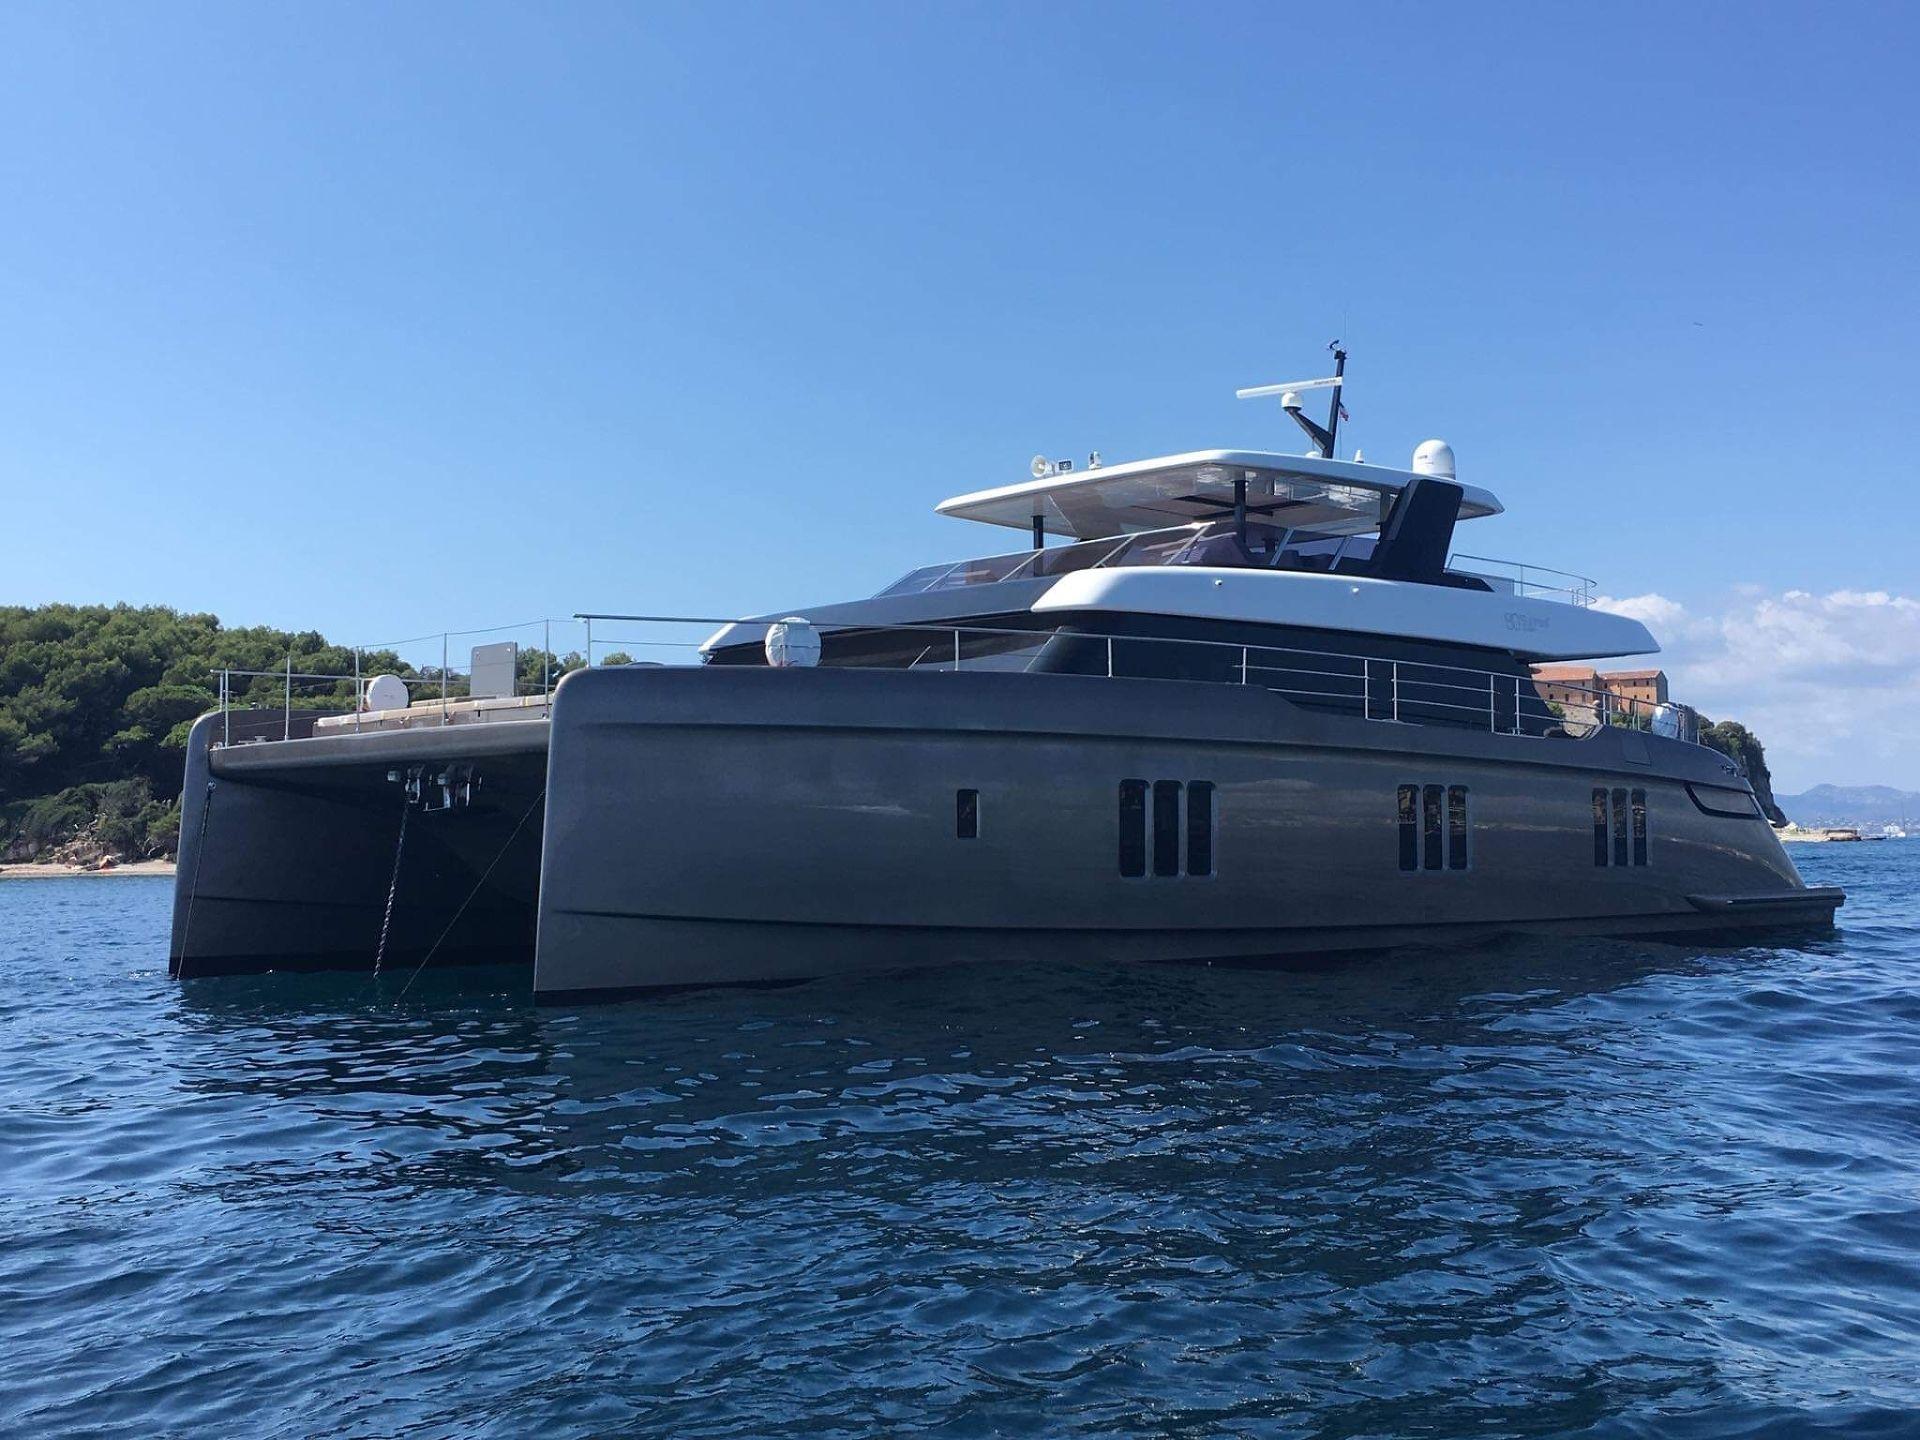 OTOCTONE 80 - Sunreef 80 - 4 Cabins - Naples - Sicily - Amalfi Coast - Corsica - Sardinia - French Riviera